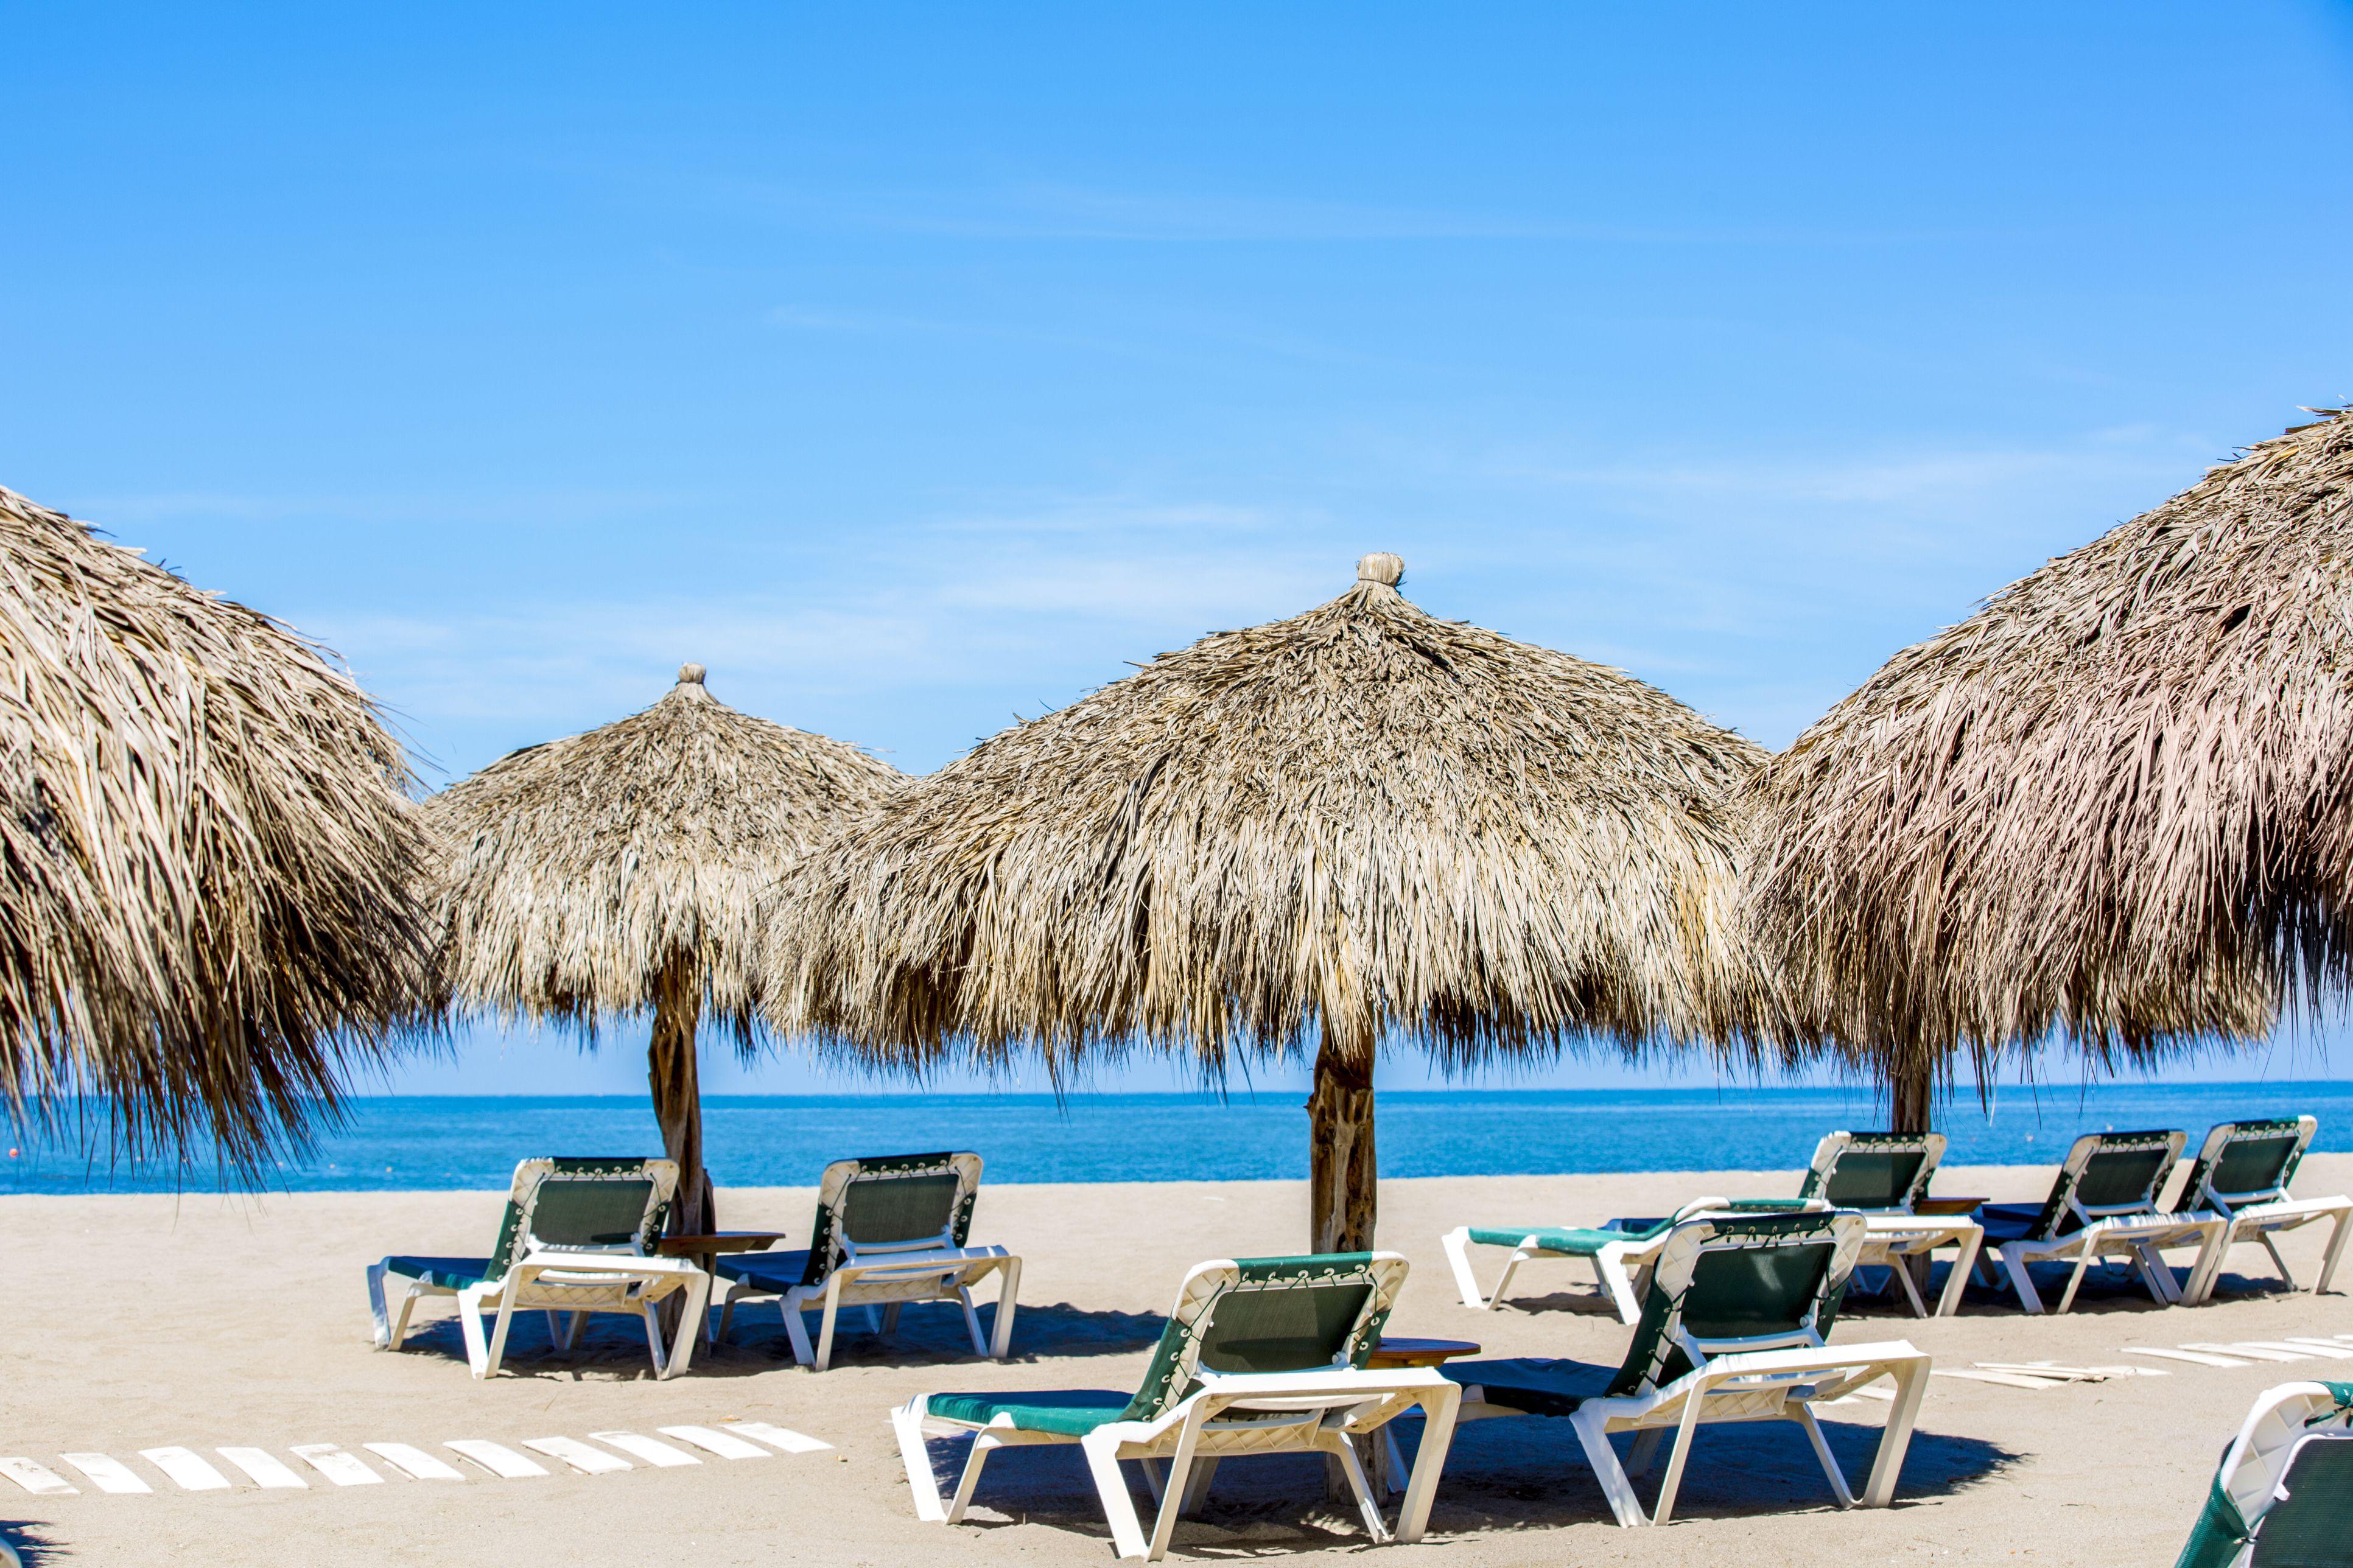 Top 10 Mexico Beach Destinations